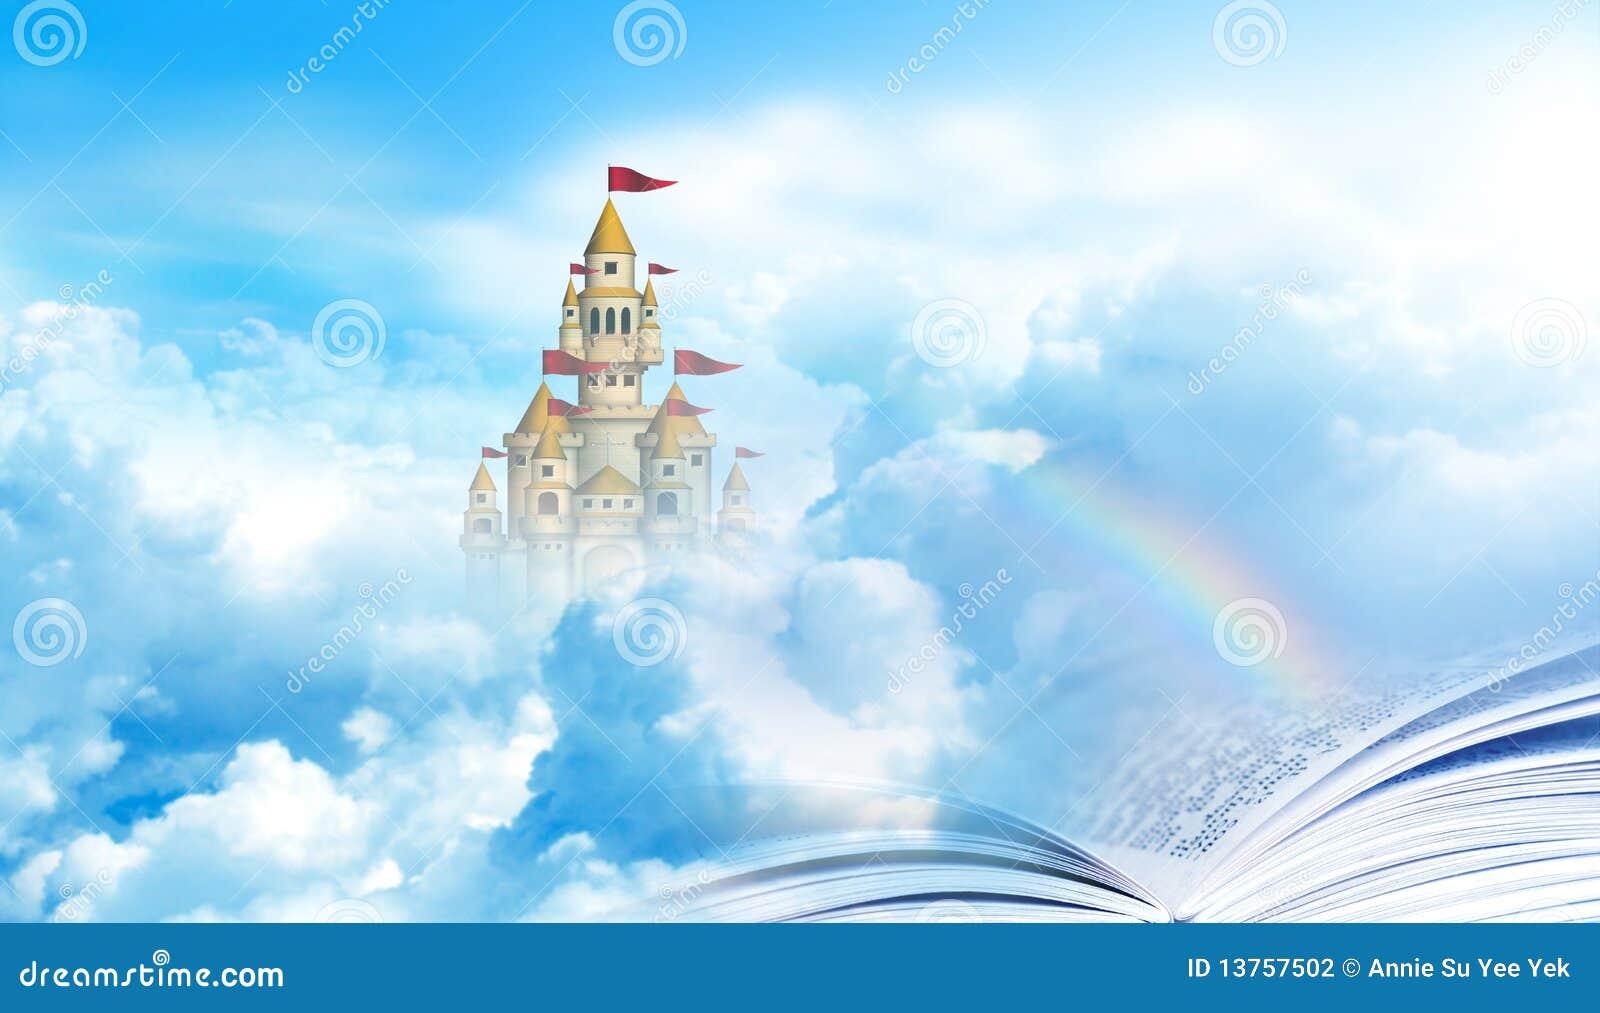 Rainbow bridge from Bible to heaven castle